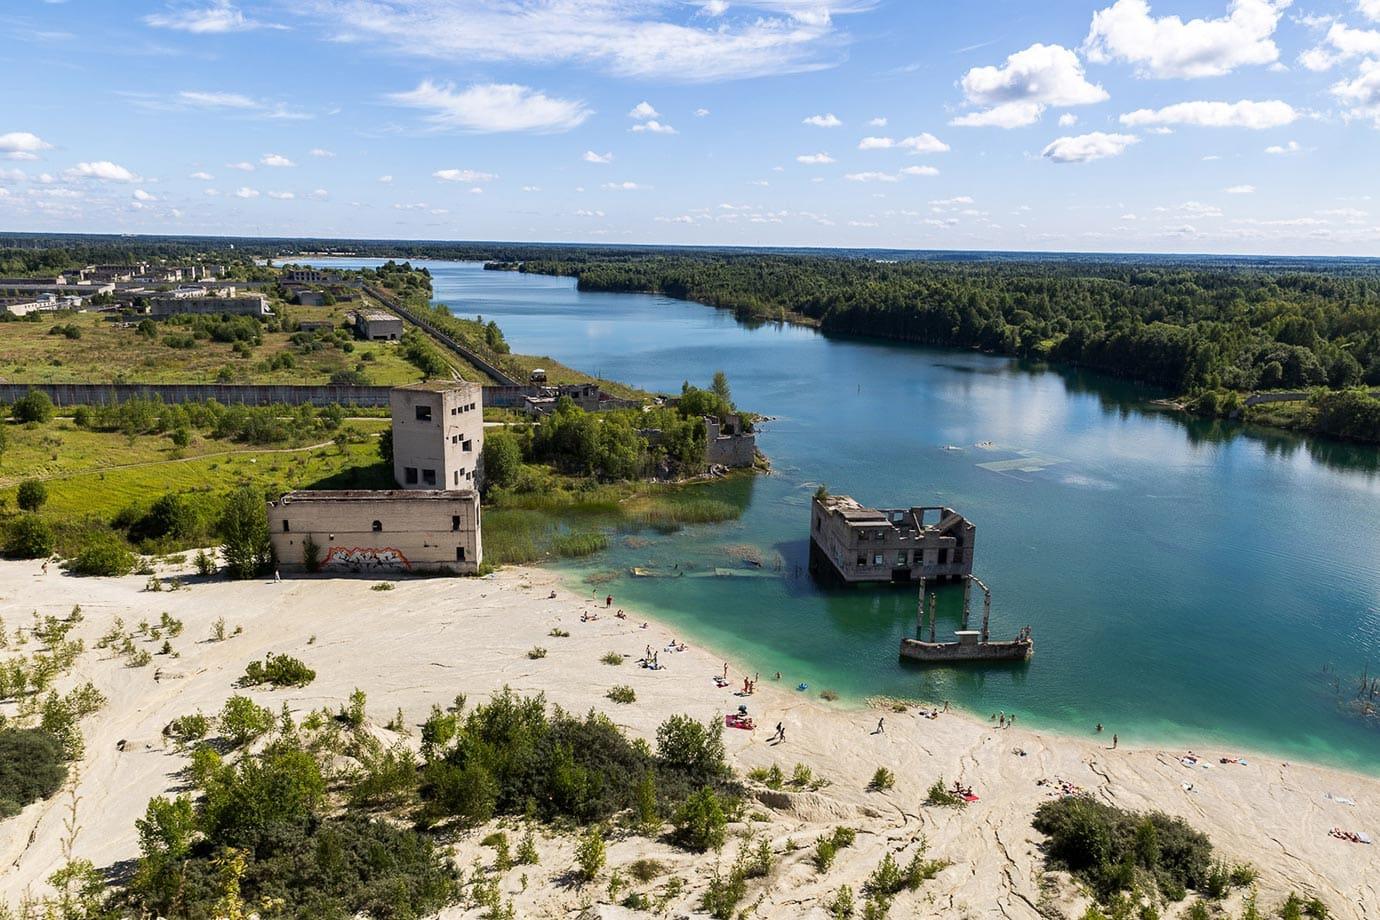 Deserted prison, Estonia